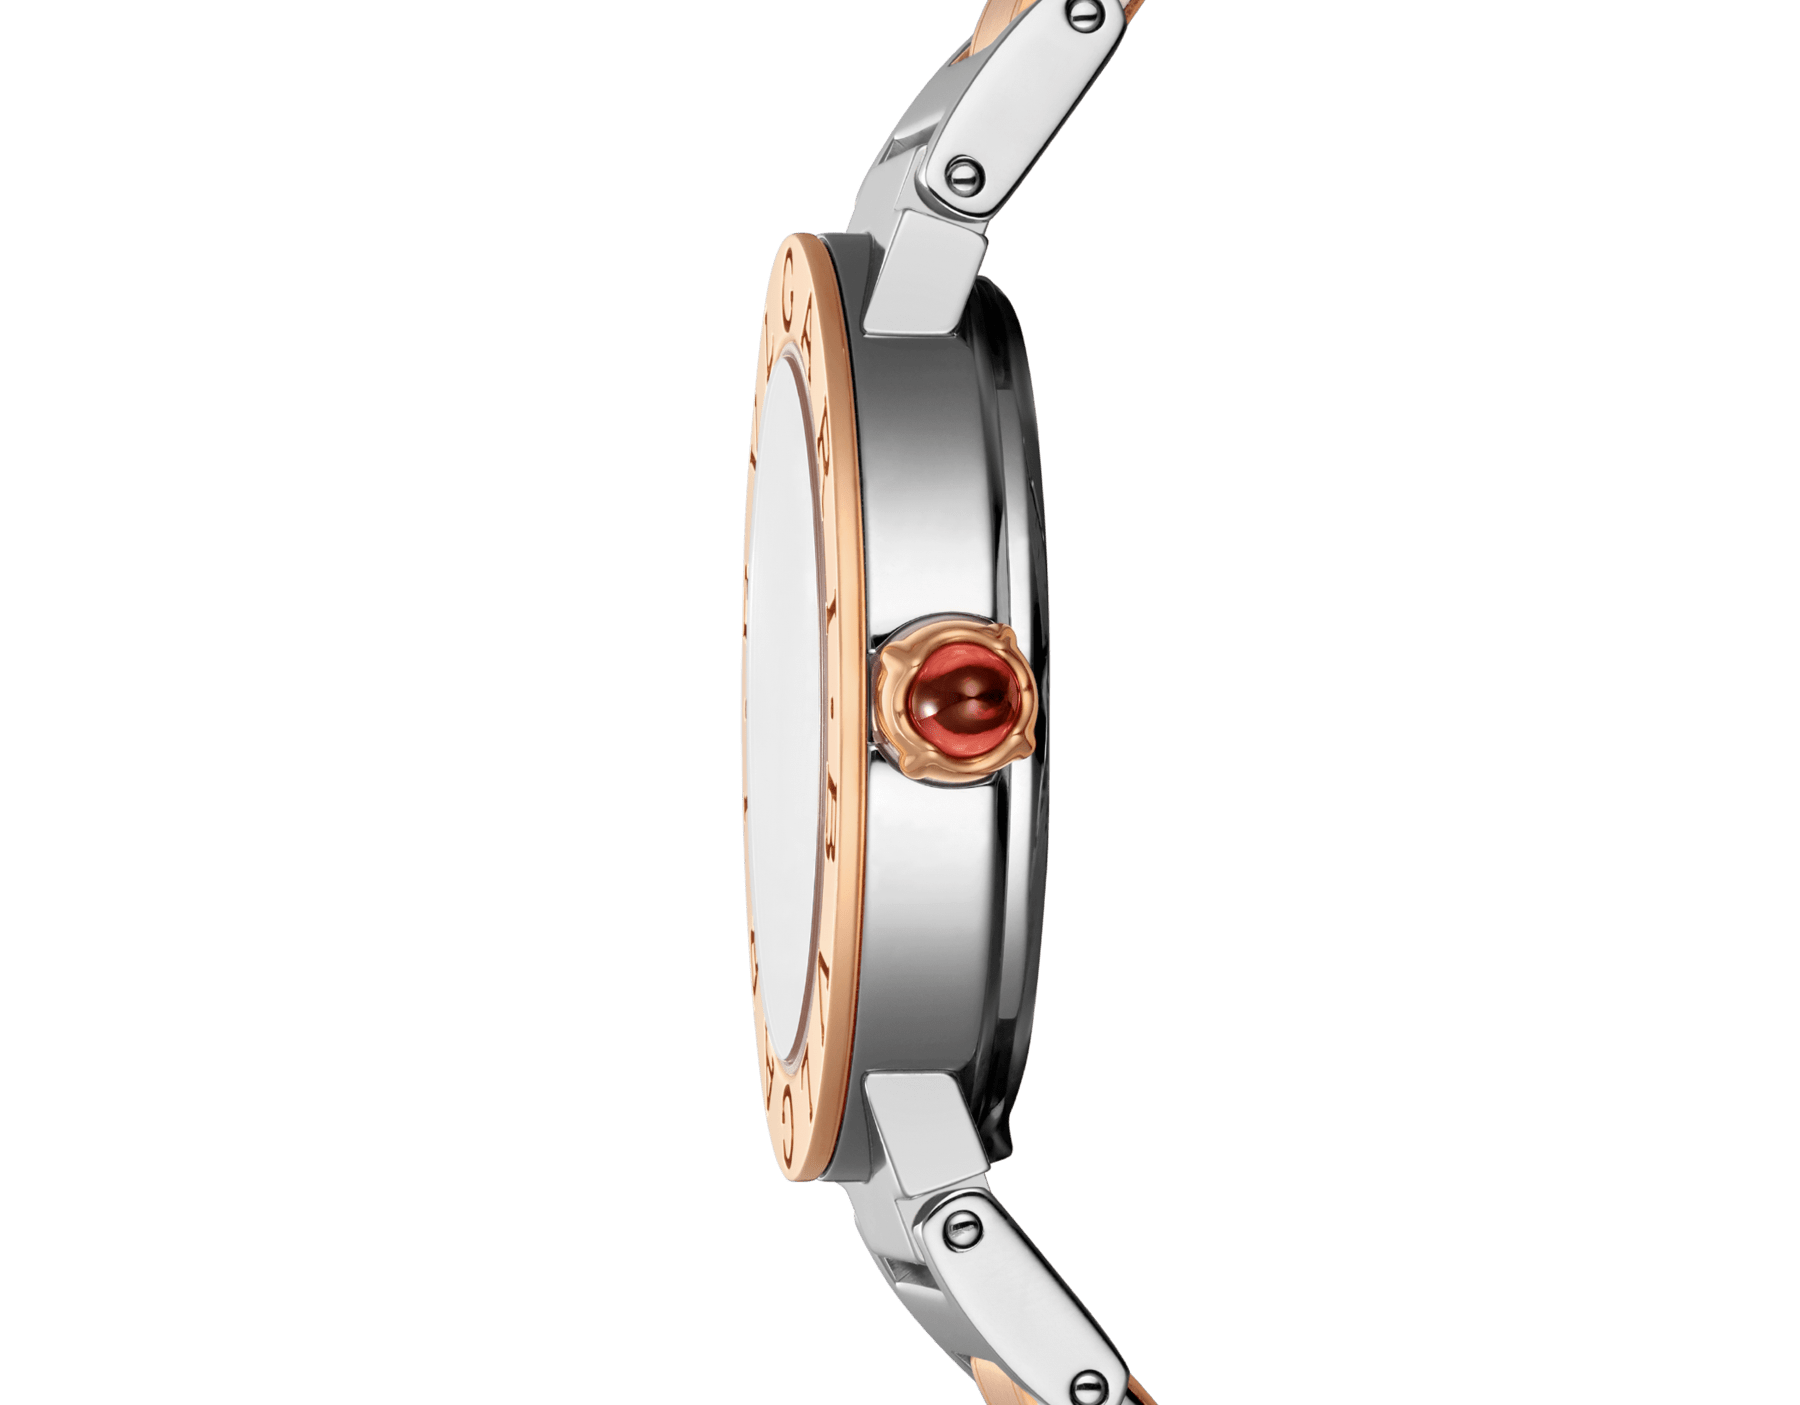 BVLGARI BVLGARI 腕錶,精鋼和 18K 玫瑰金錶殼和錶帶,棕色太陽紋漆面錶盤,鑽石時標。S 尺寸。 102155 image 3